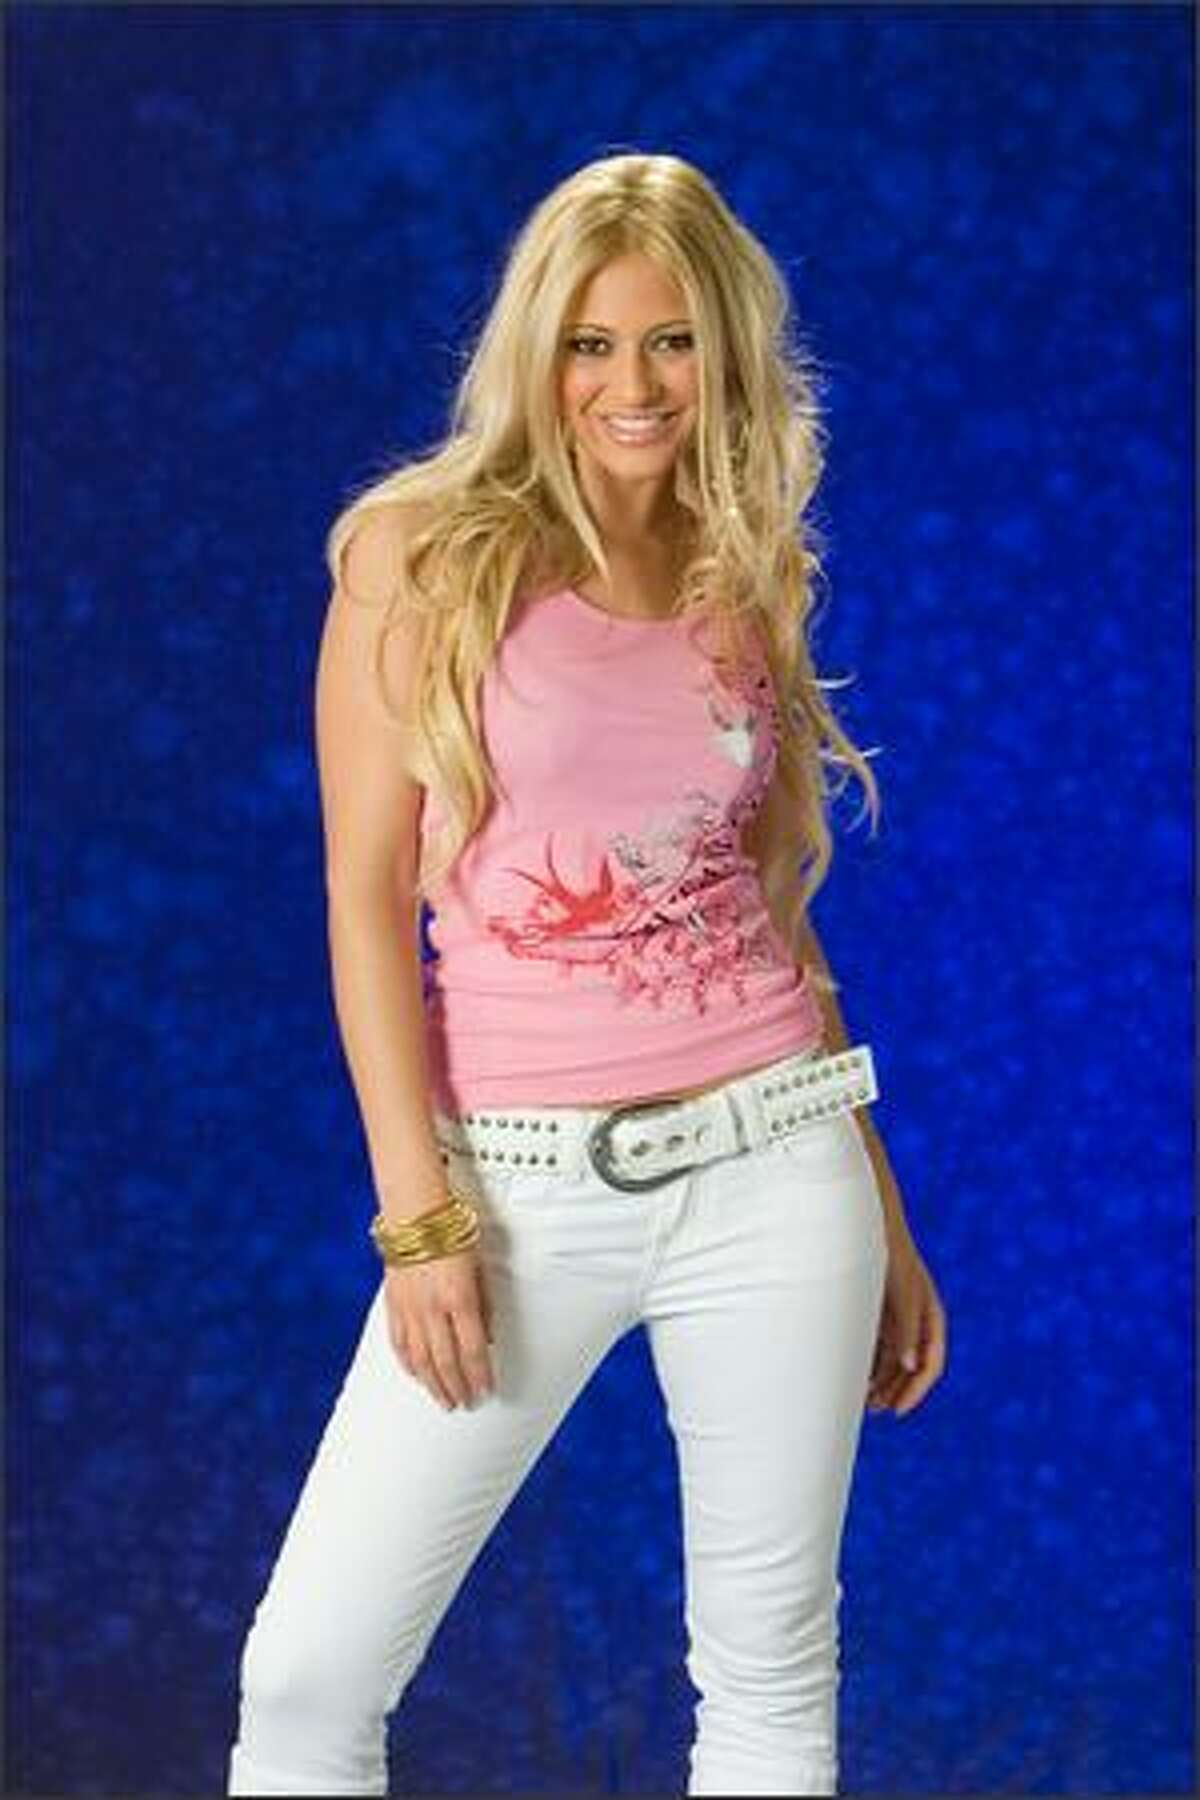 Christa Rigozzi, Miss Switzerland 2007.